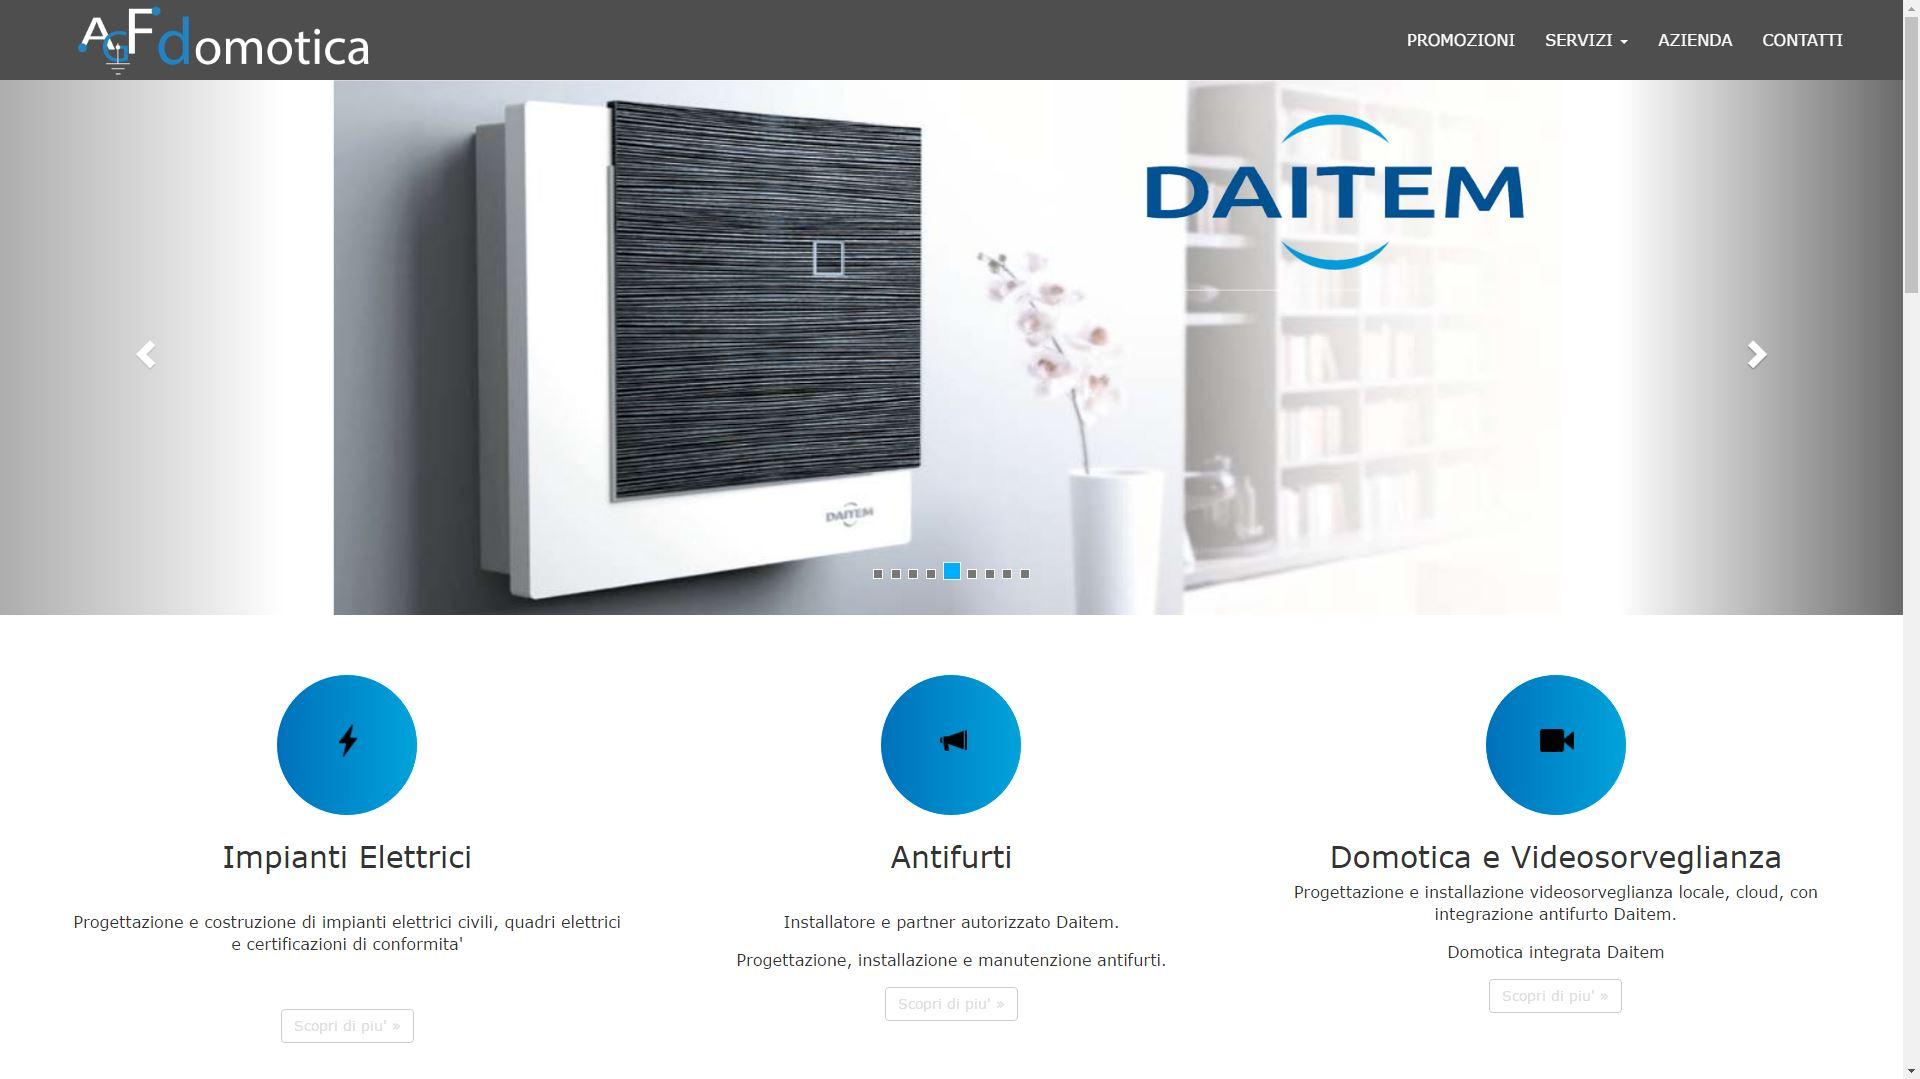 Mk Computers - Assistenza PC e Siti Web Caselle Torinese - AGF Domotica Carosello Home Page